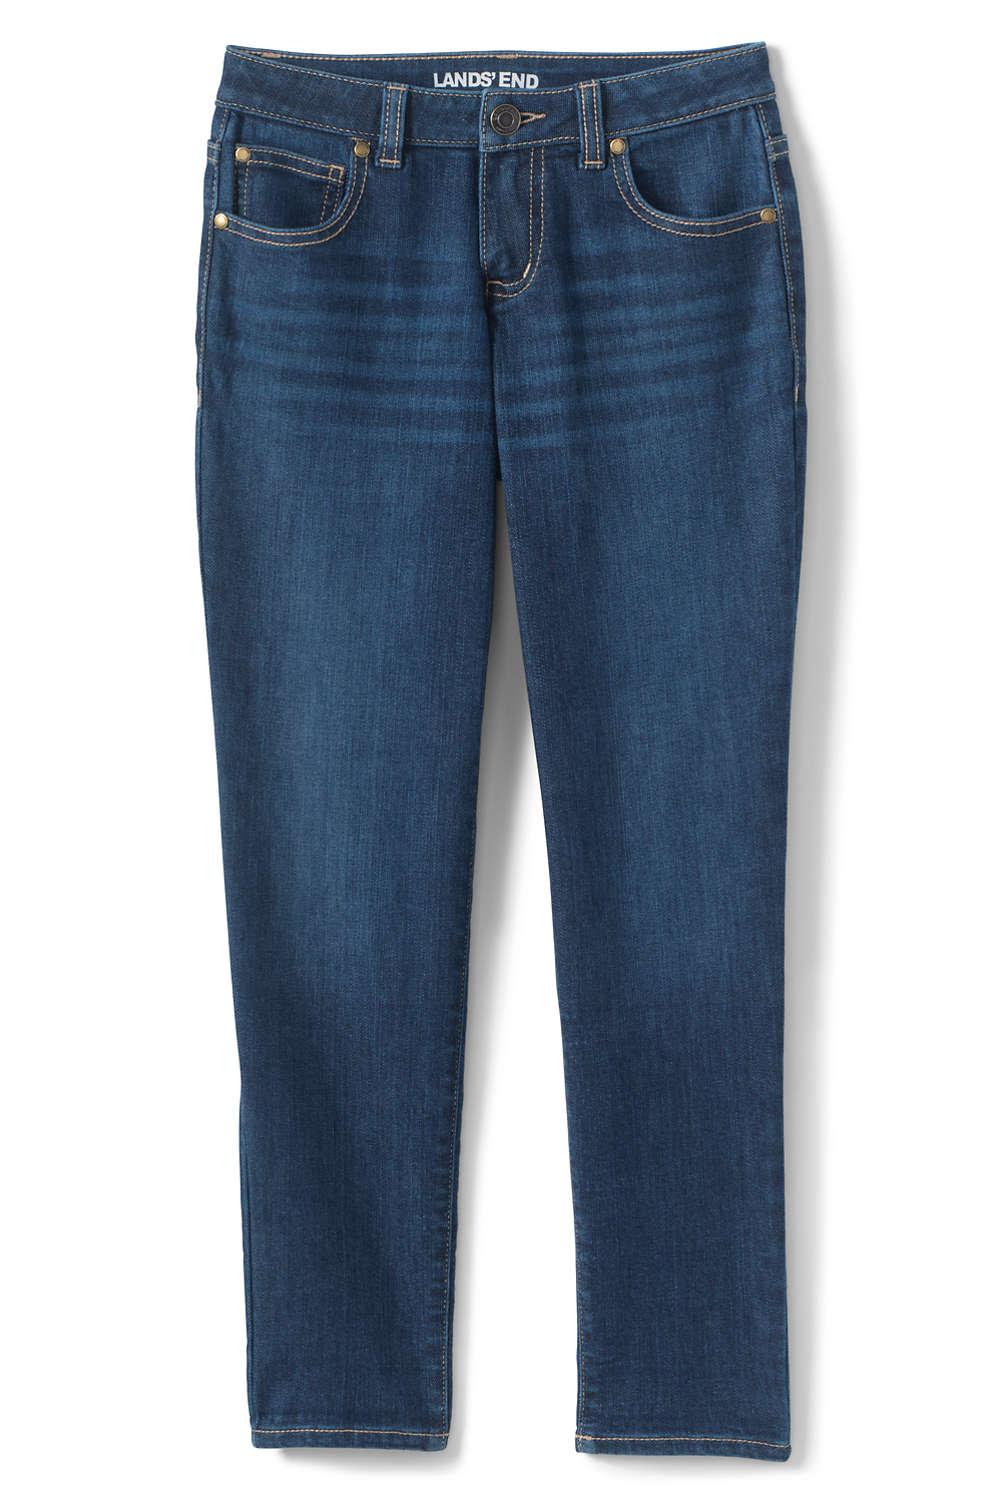 Girls Plus Size Iron Knee Girlfriend Jeans